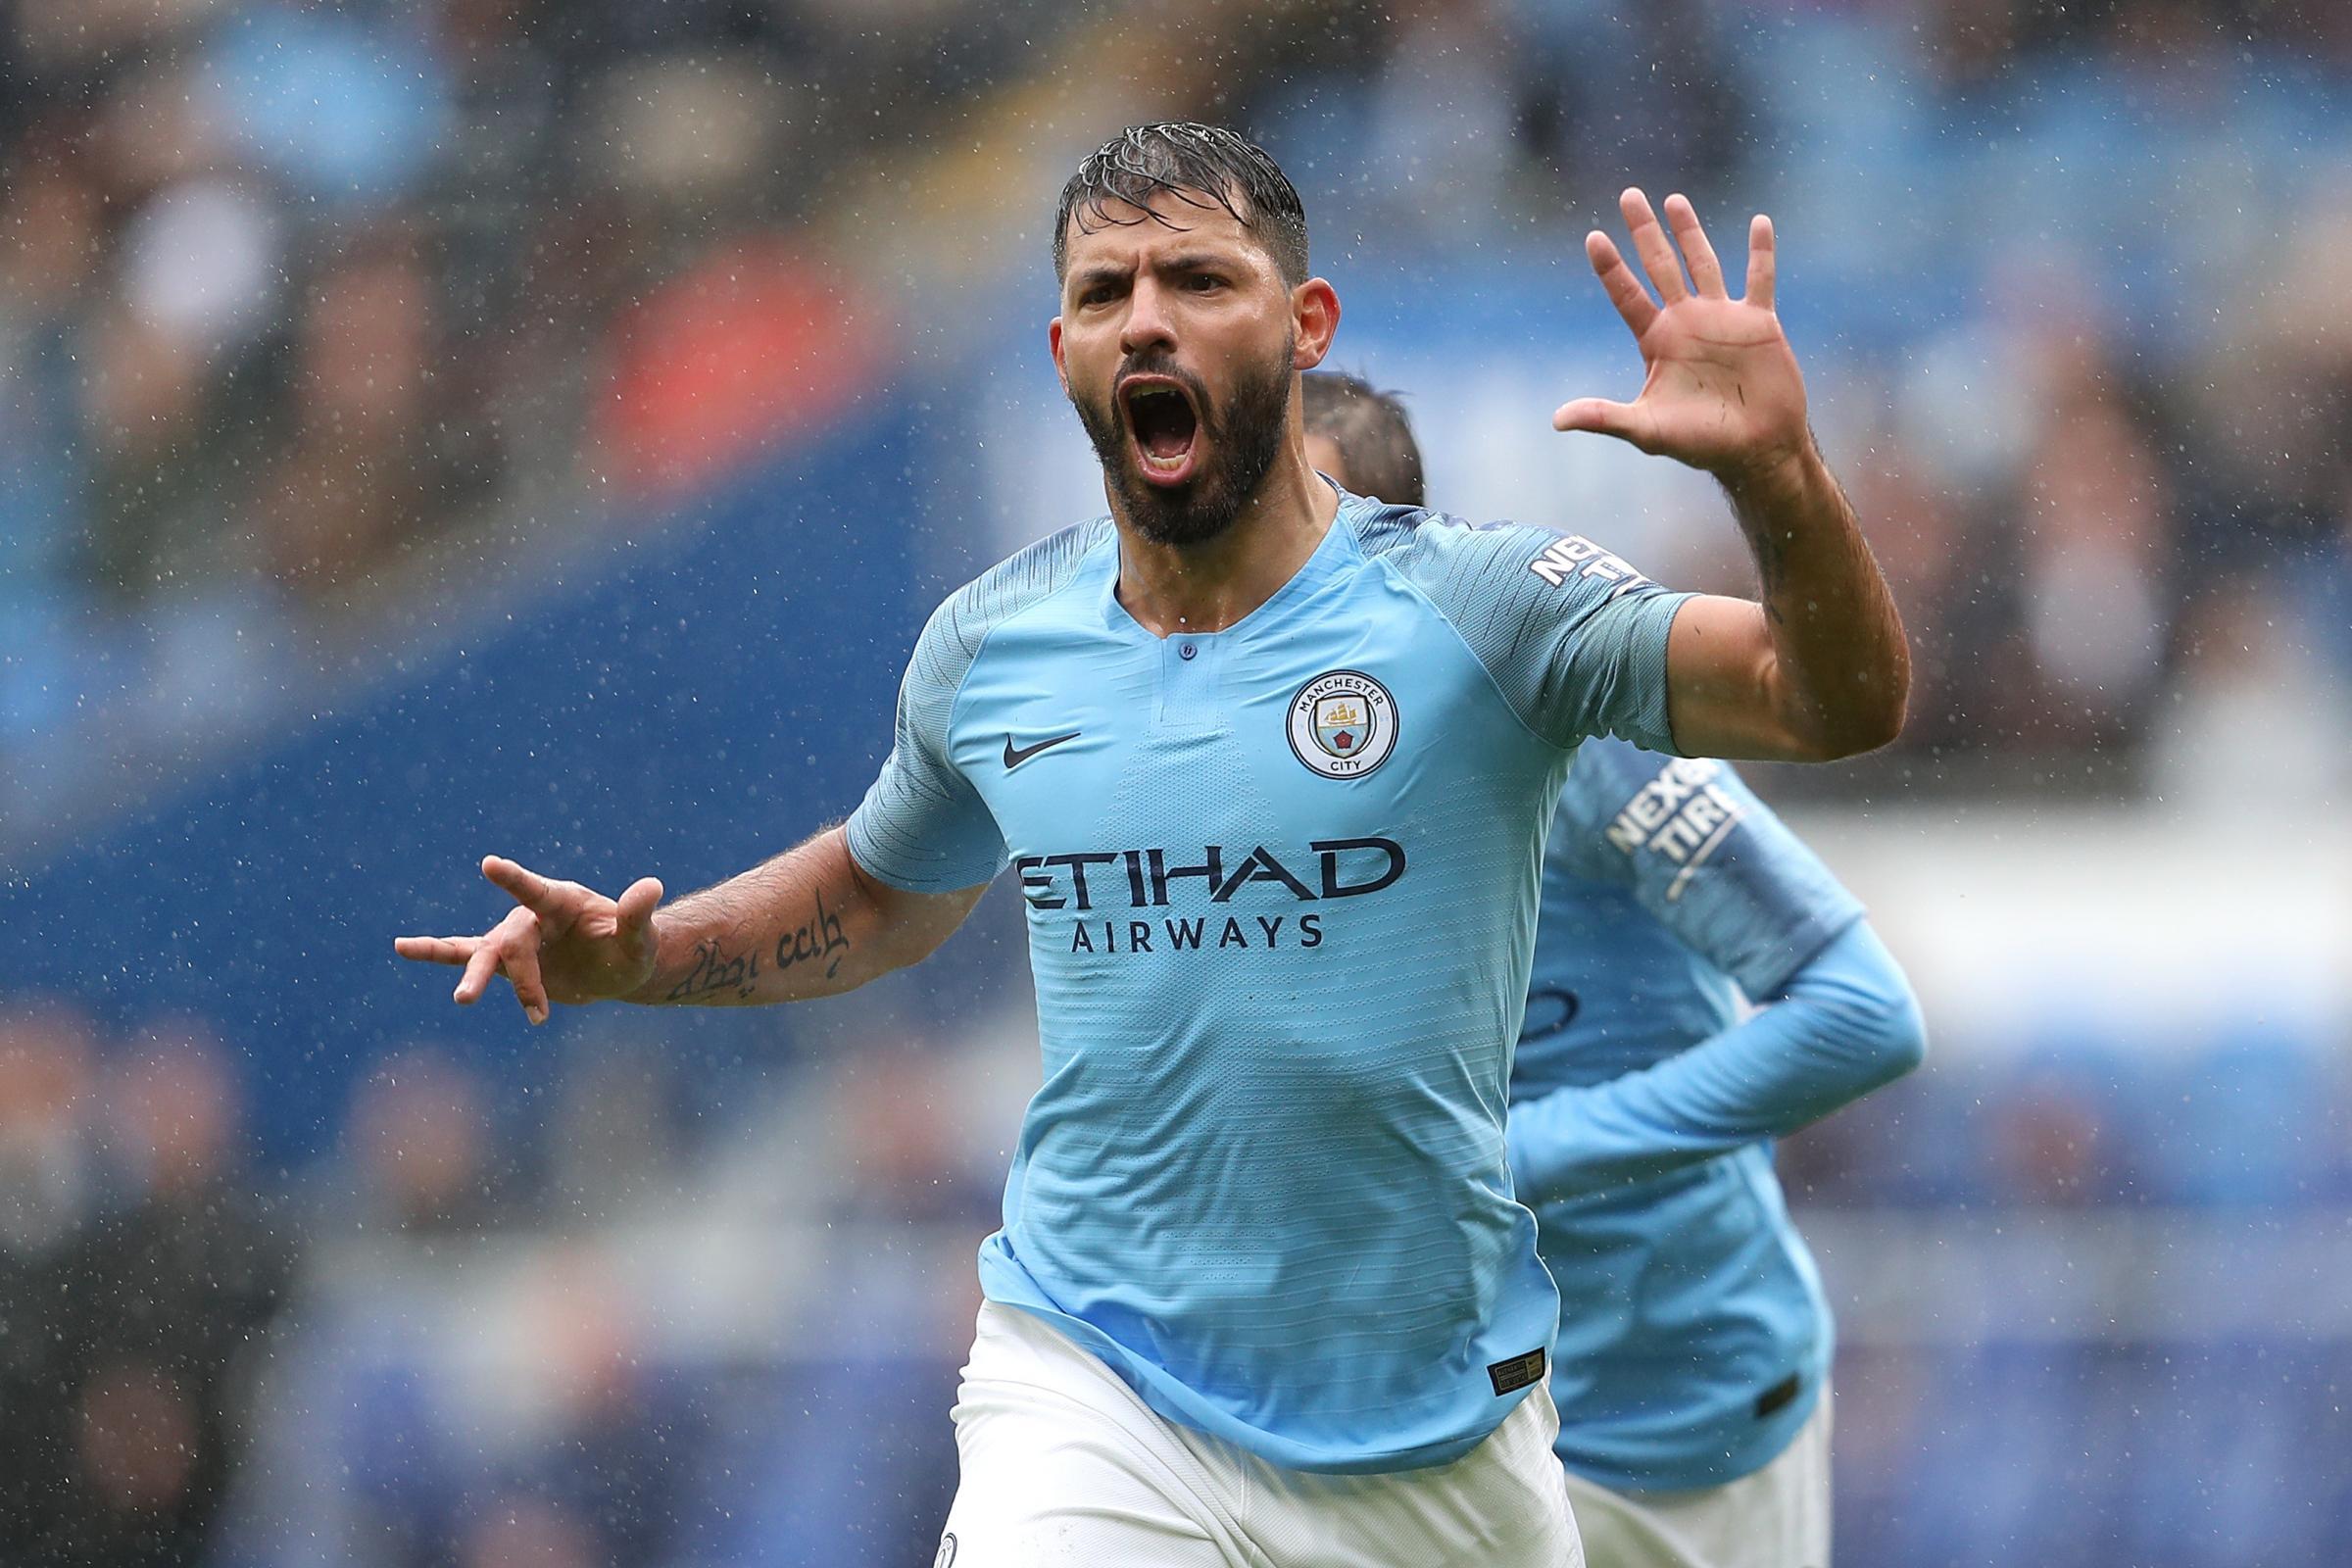 No Lyon hangover for City as the roar past Cardiff | Warrington Guardian